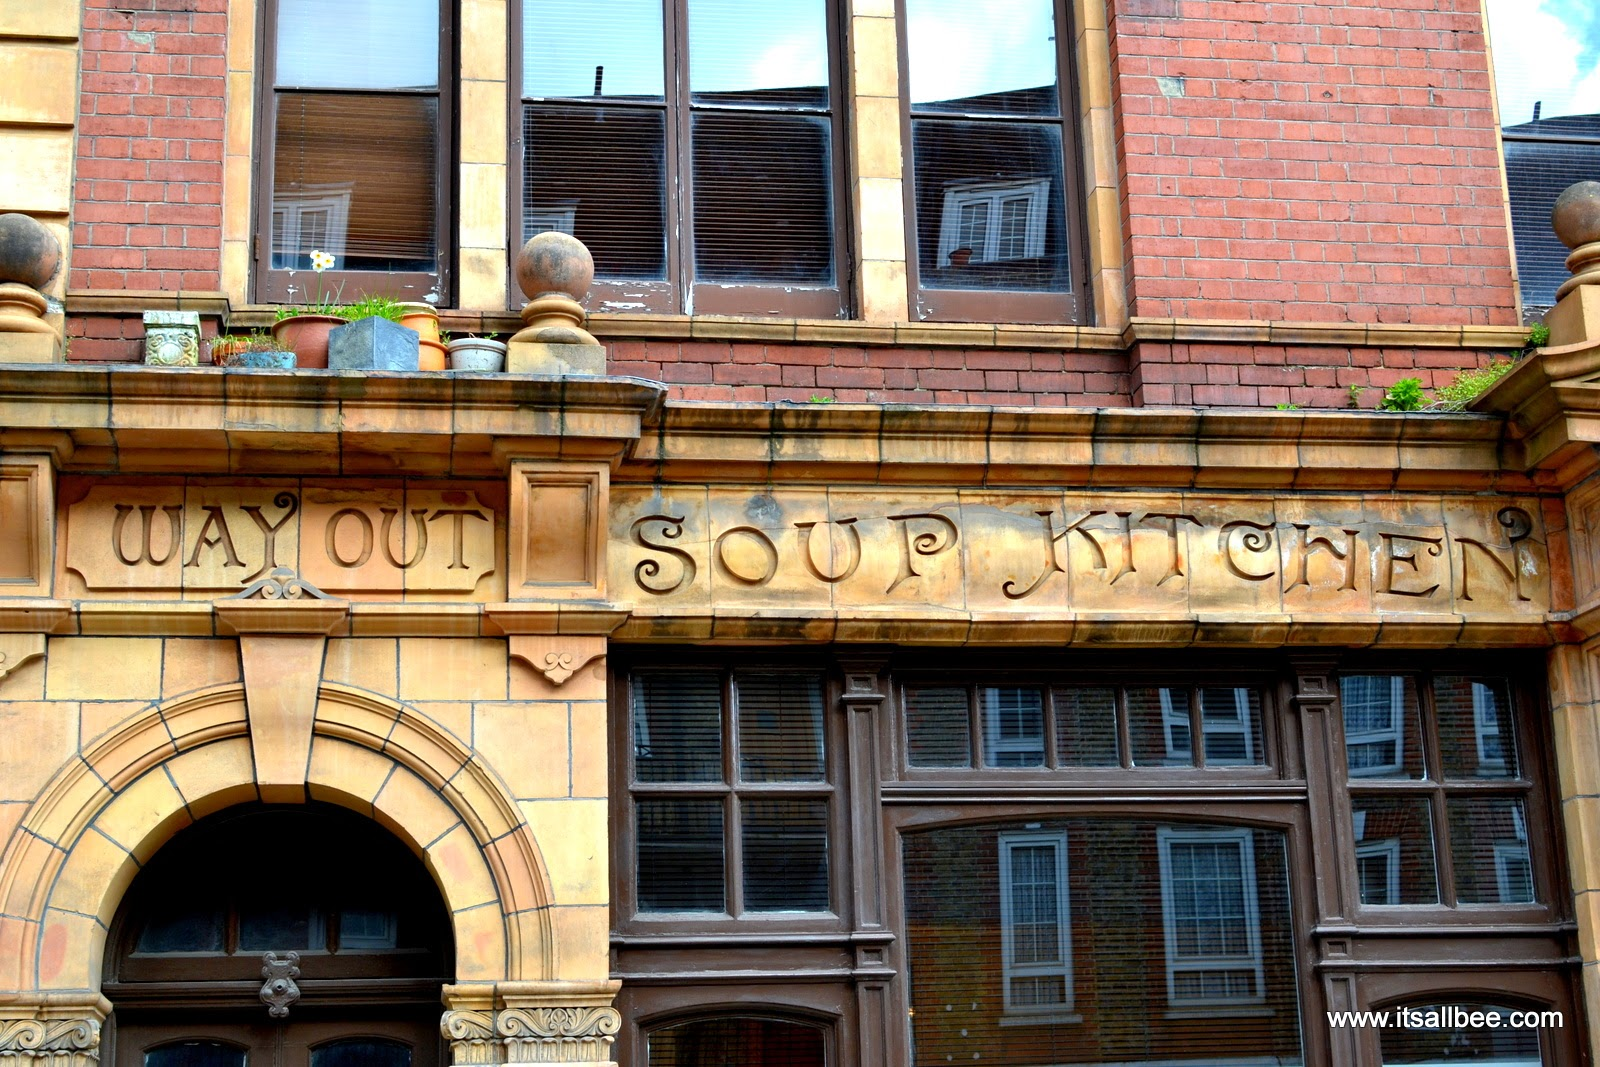 Jewish Ghetto London Soup Kitchen